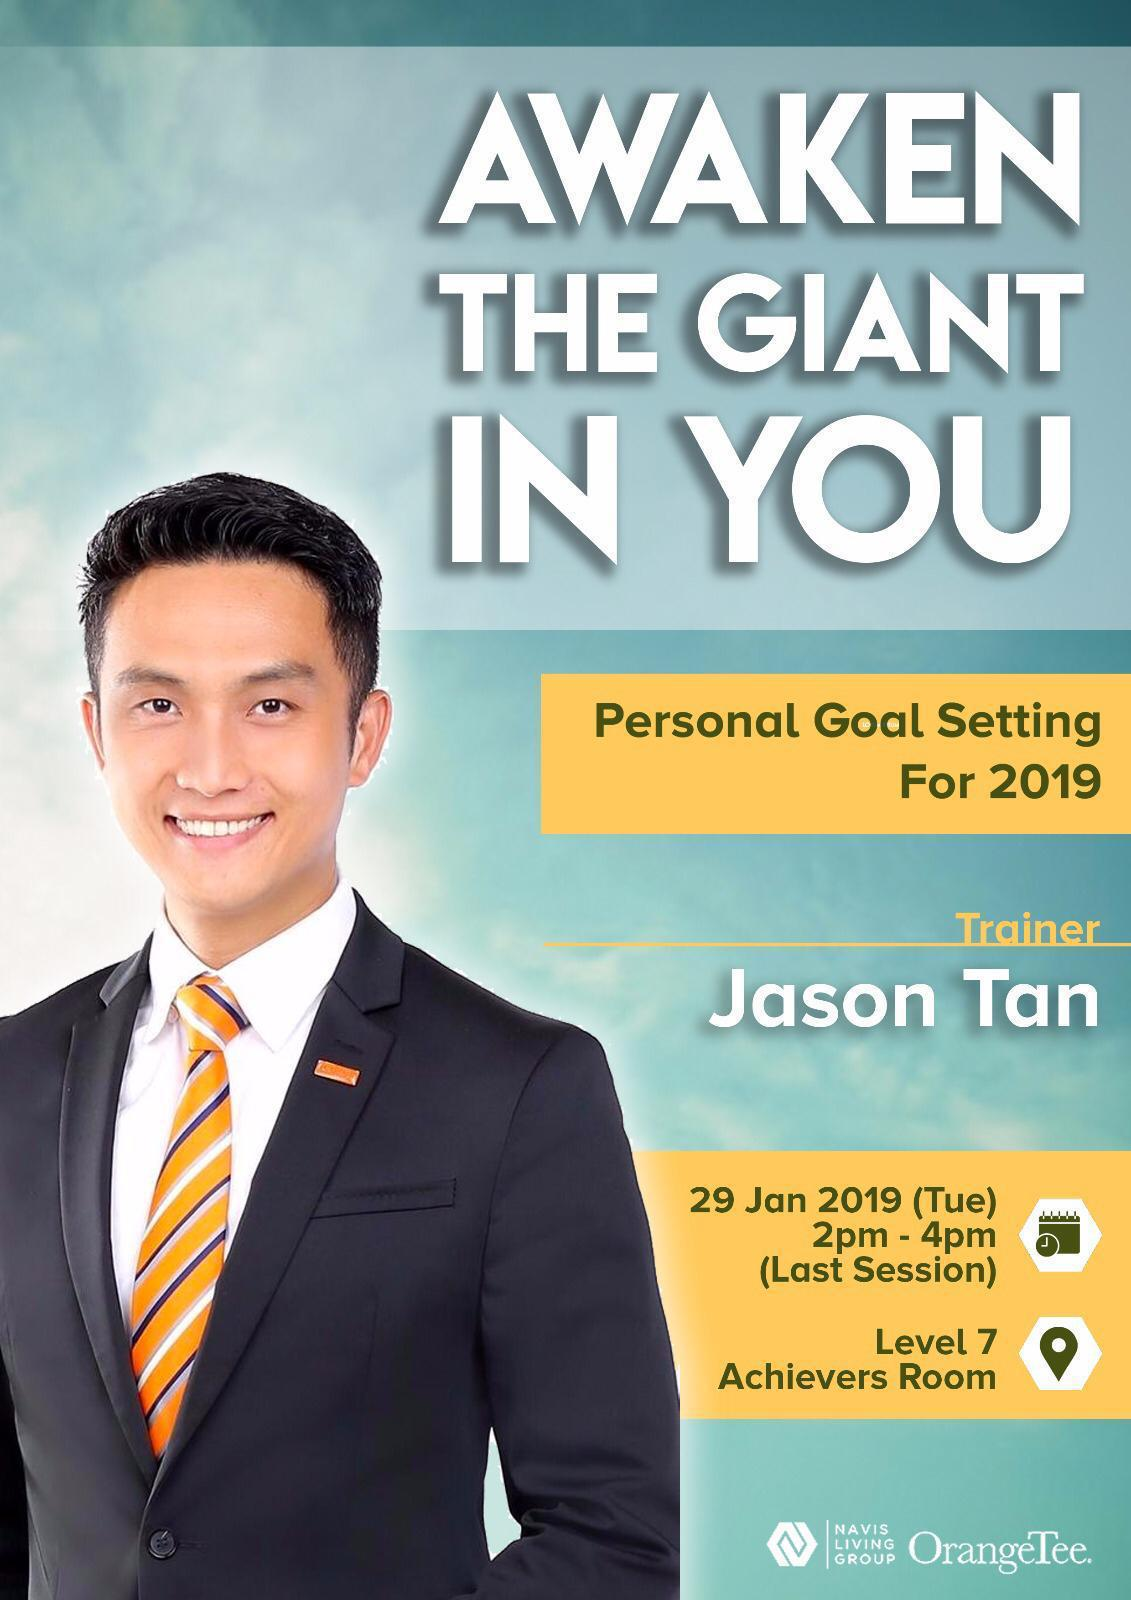 Personal Goal Setting Guidance